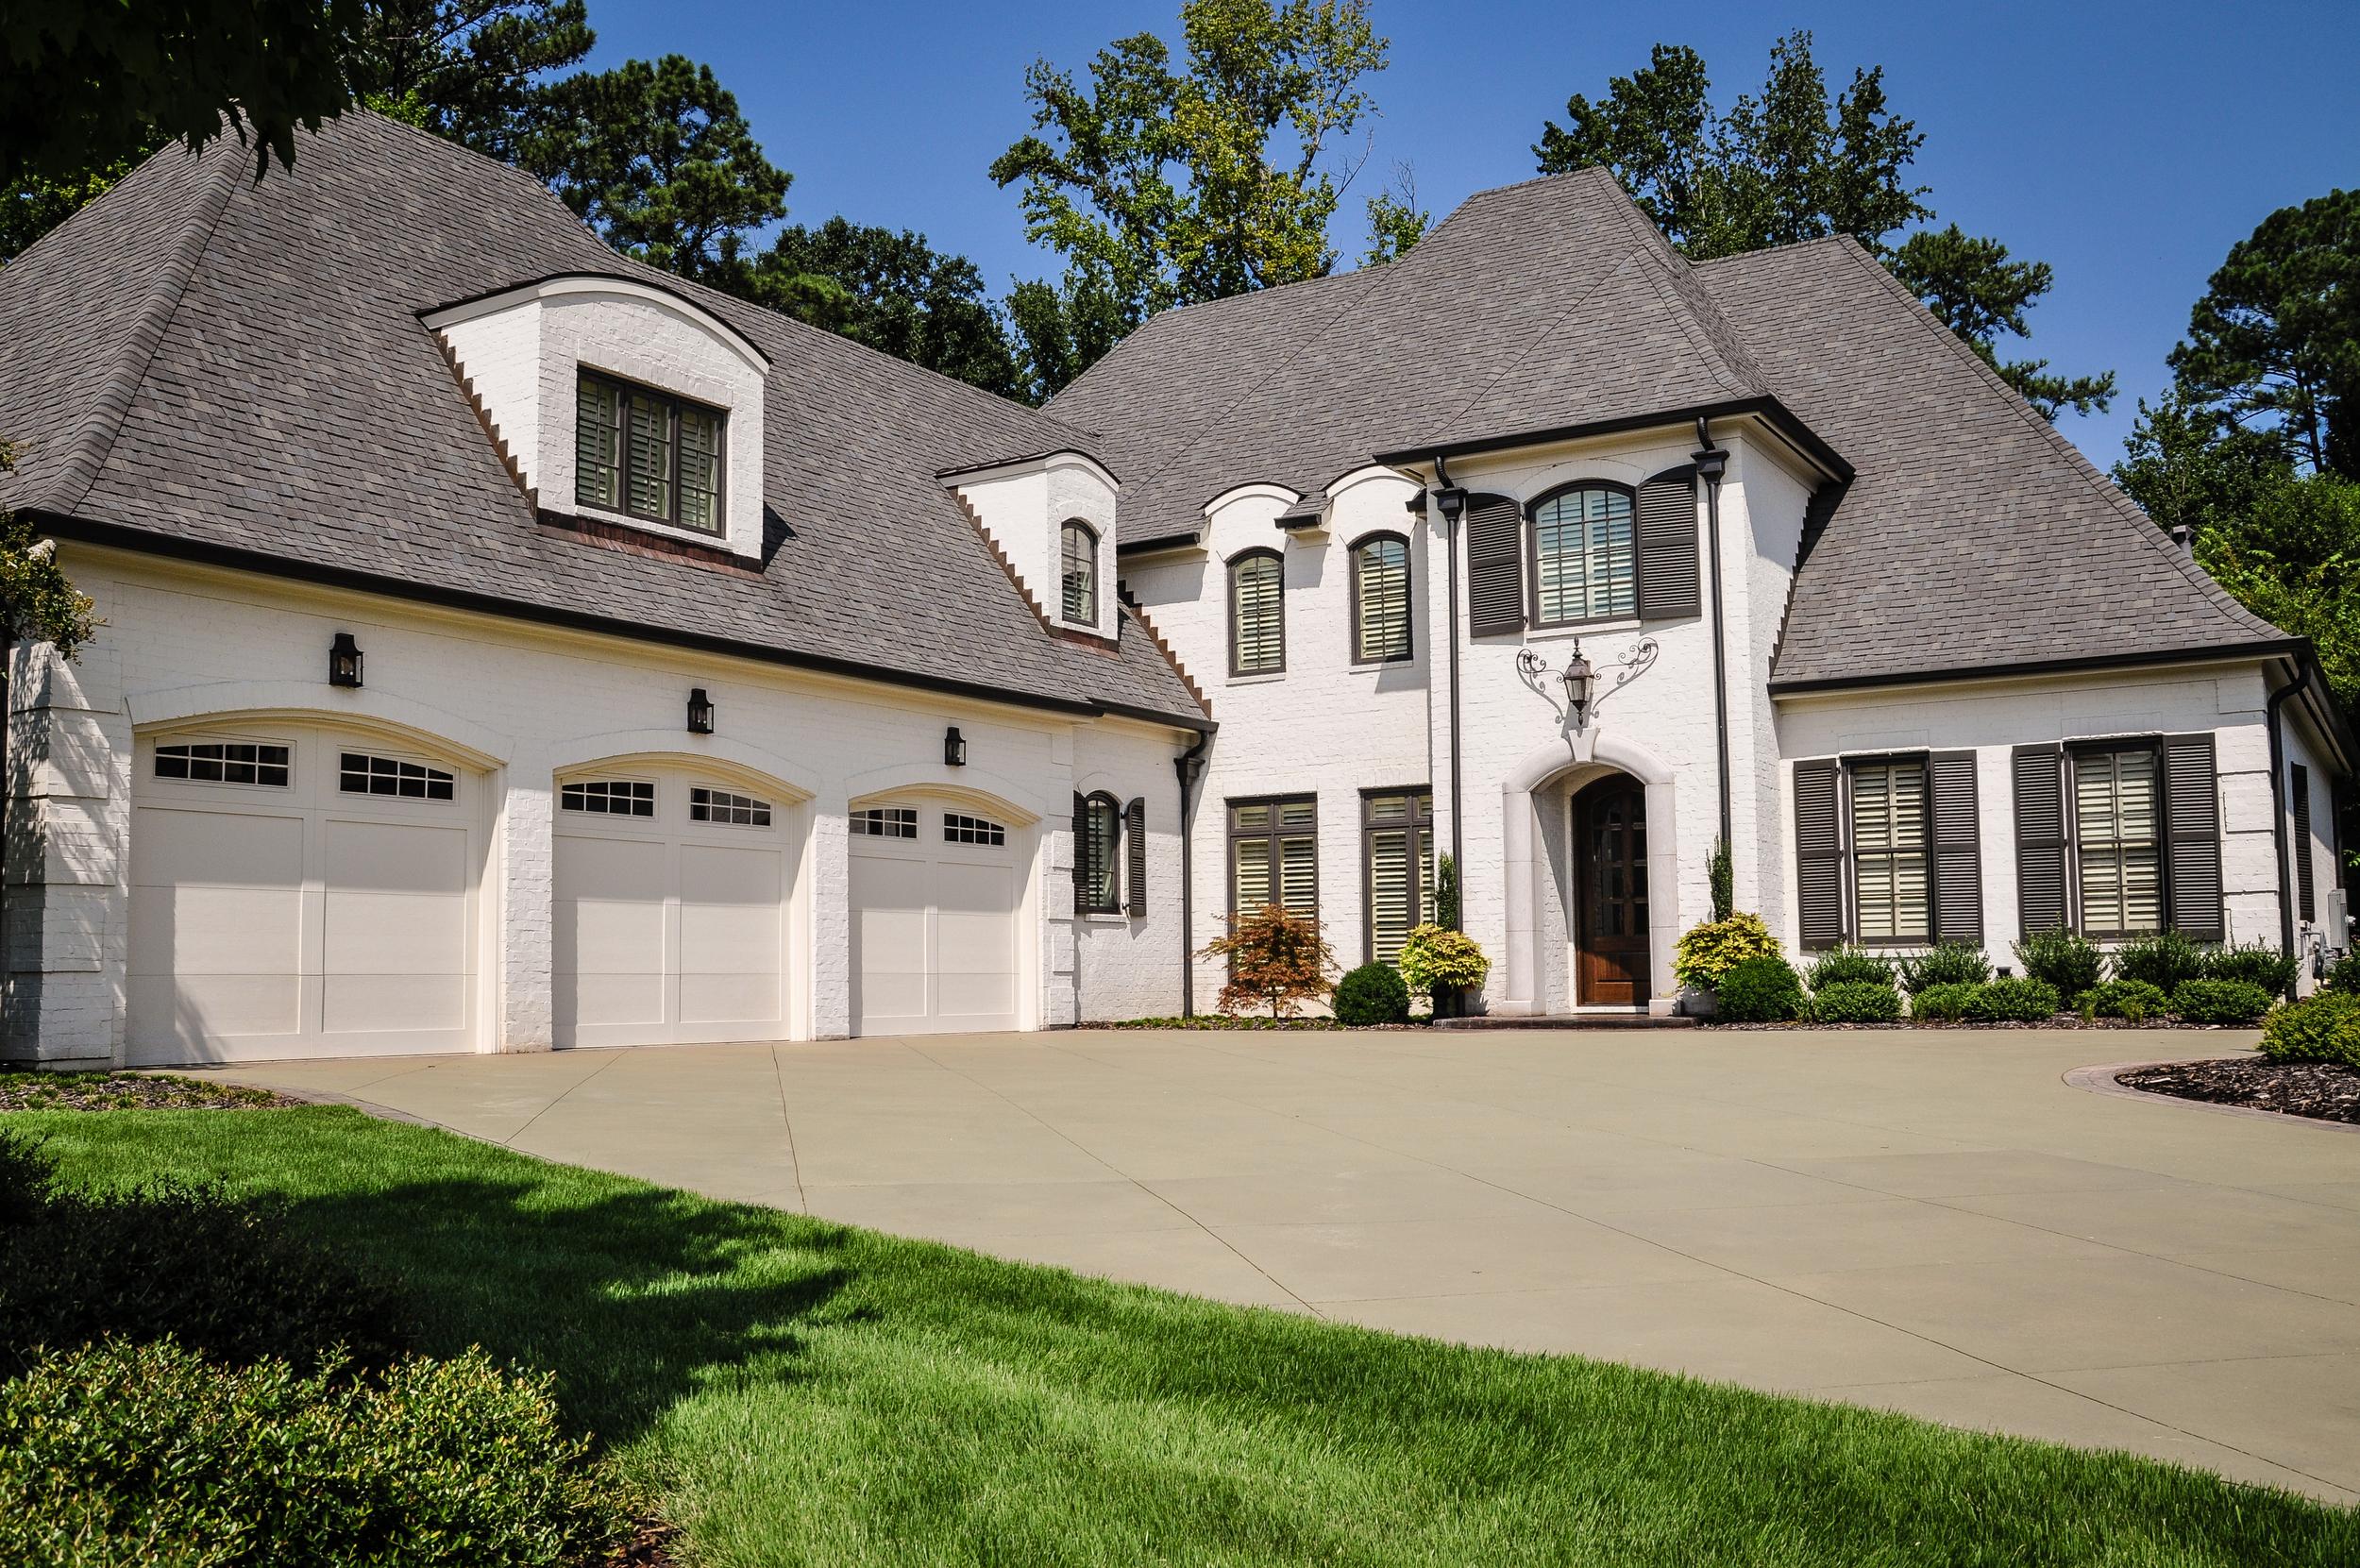 Toulmin Homes - Tuscaloosa, AL custom home builder and remodeler (4 of 4).jpg